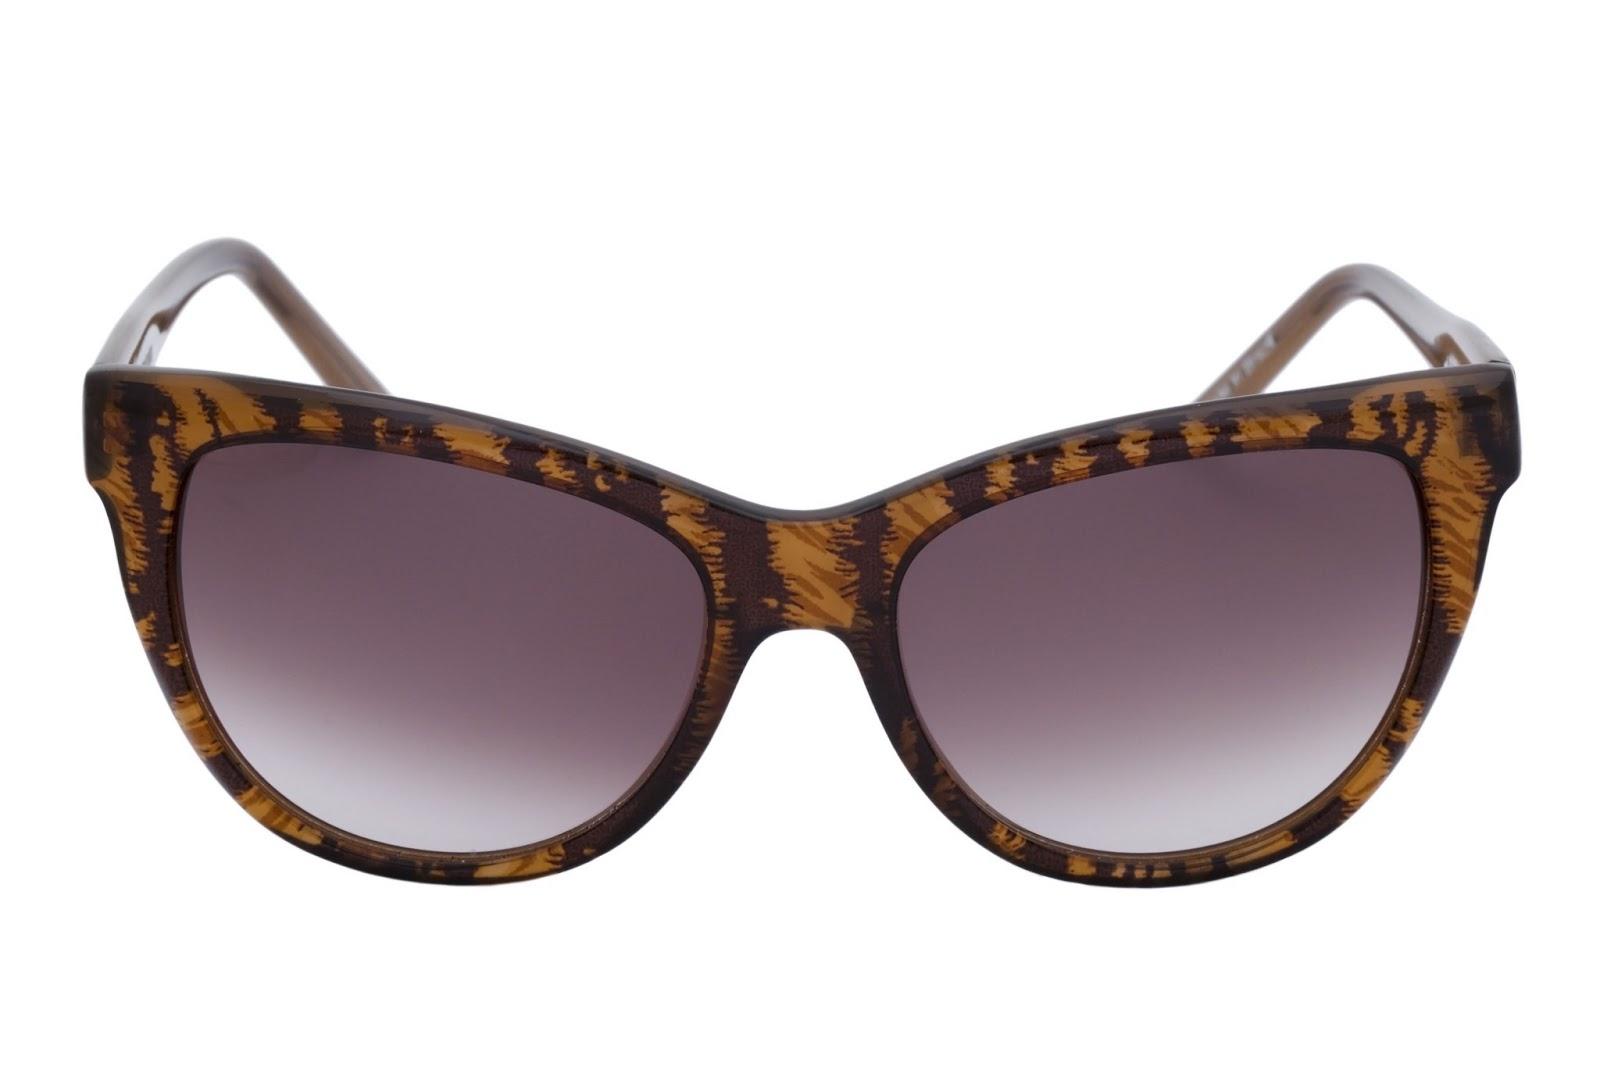 Onde Comprar Oculos Ray Ban Em New York   City of Kenmore, Washington 2b4b5ab3a7